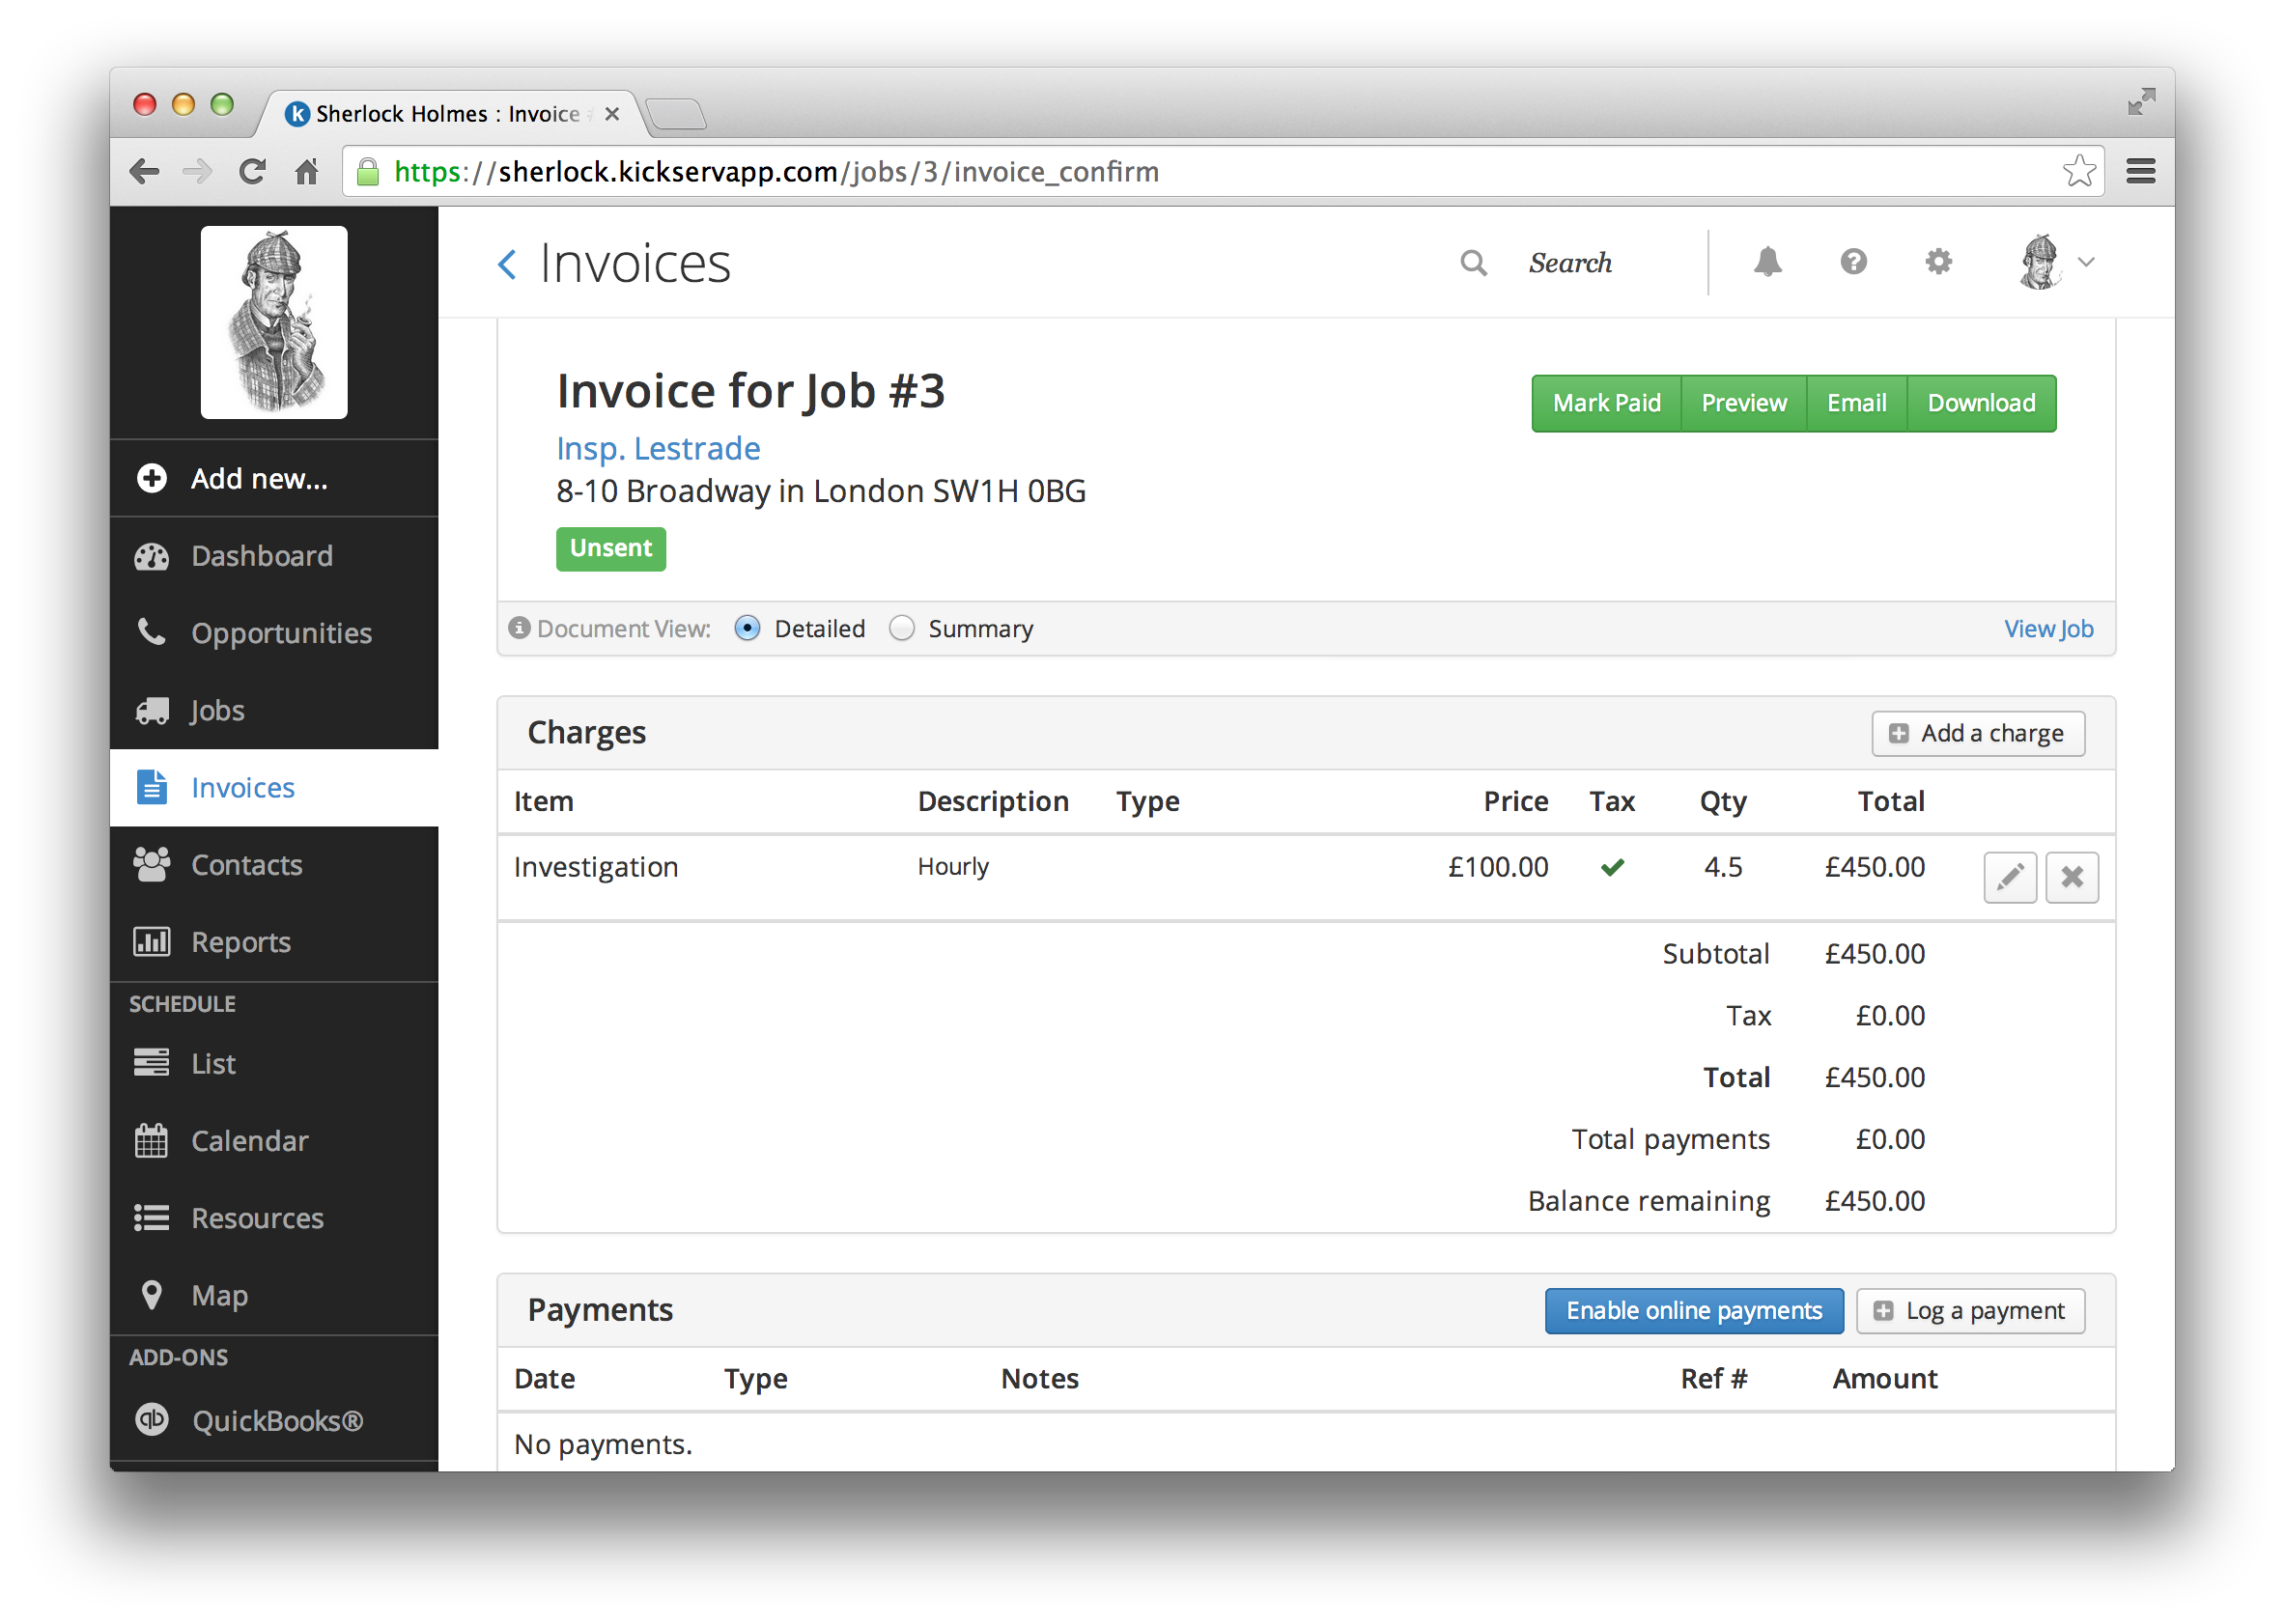 Kickserv Demo - Invoices